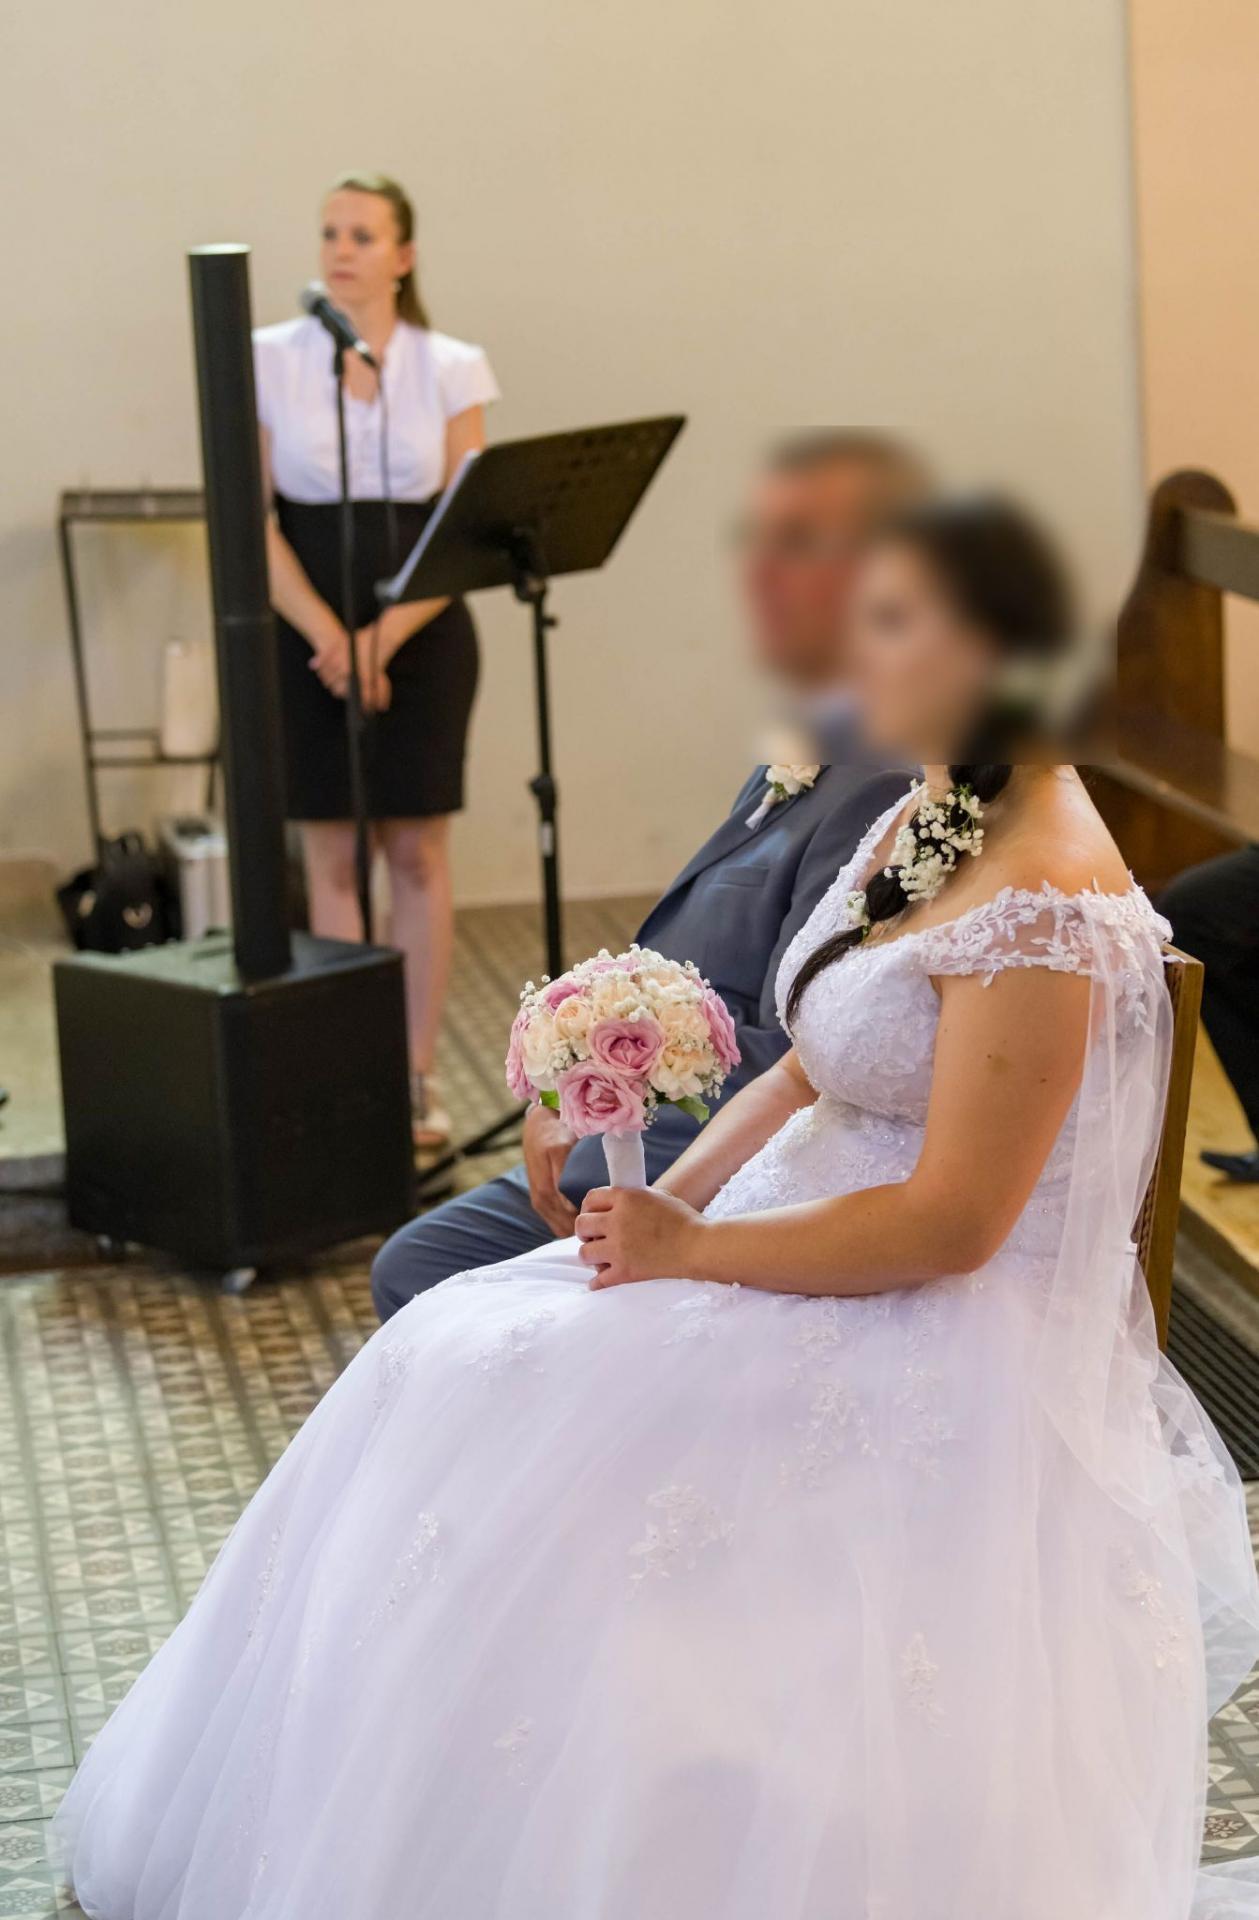 Ceremonie image 3